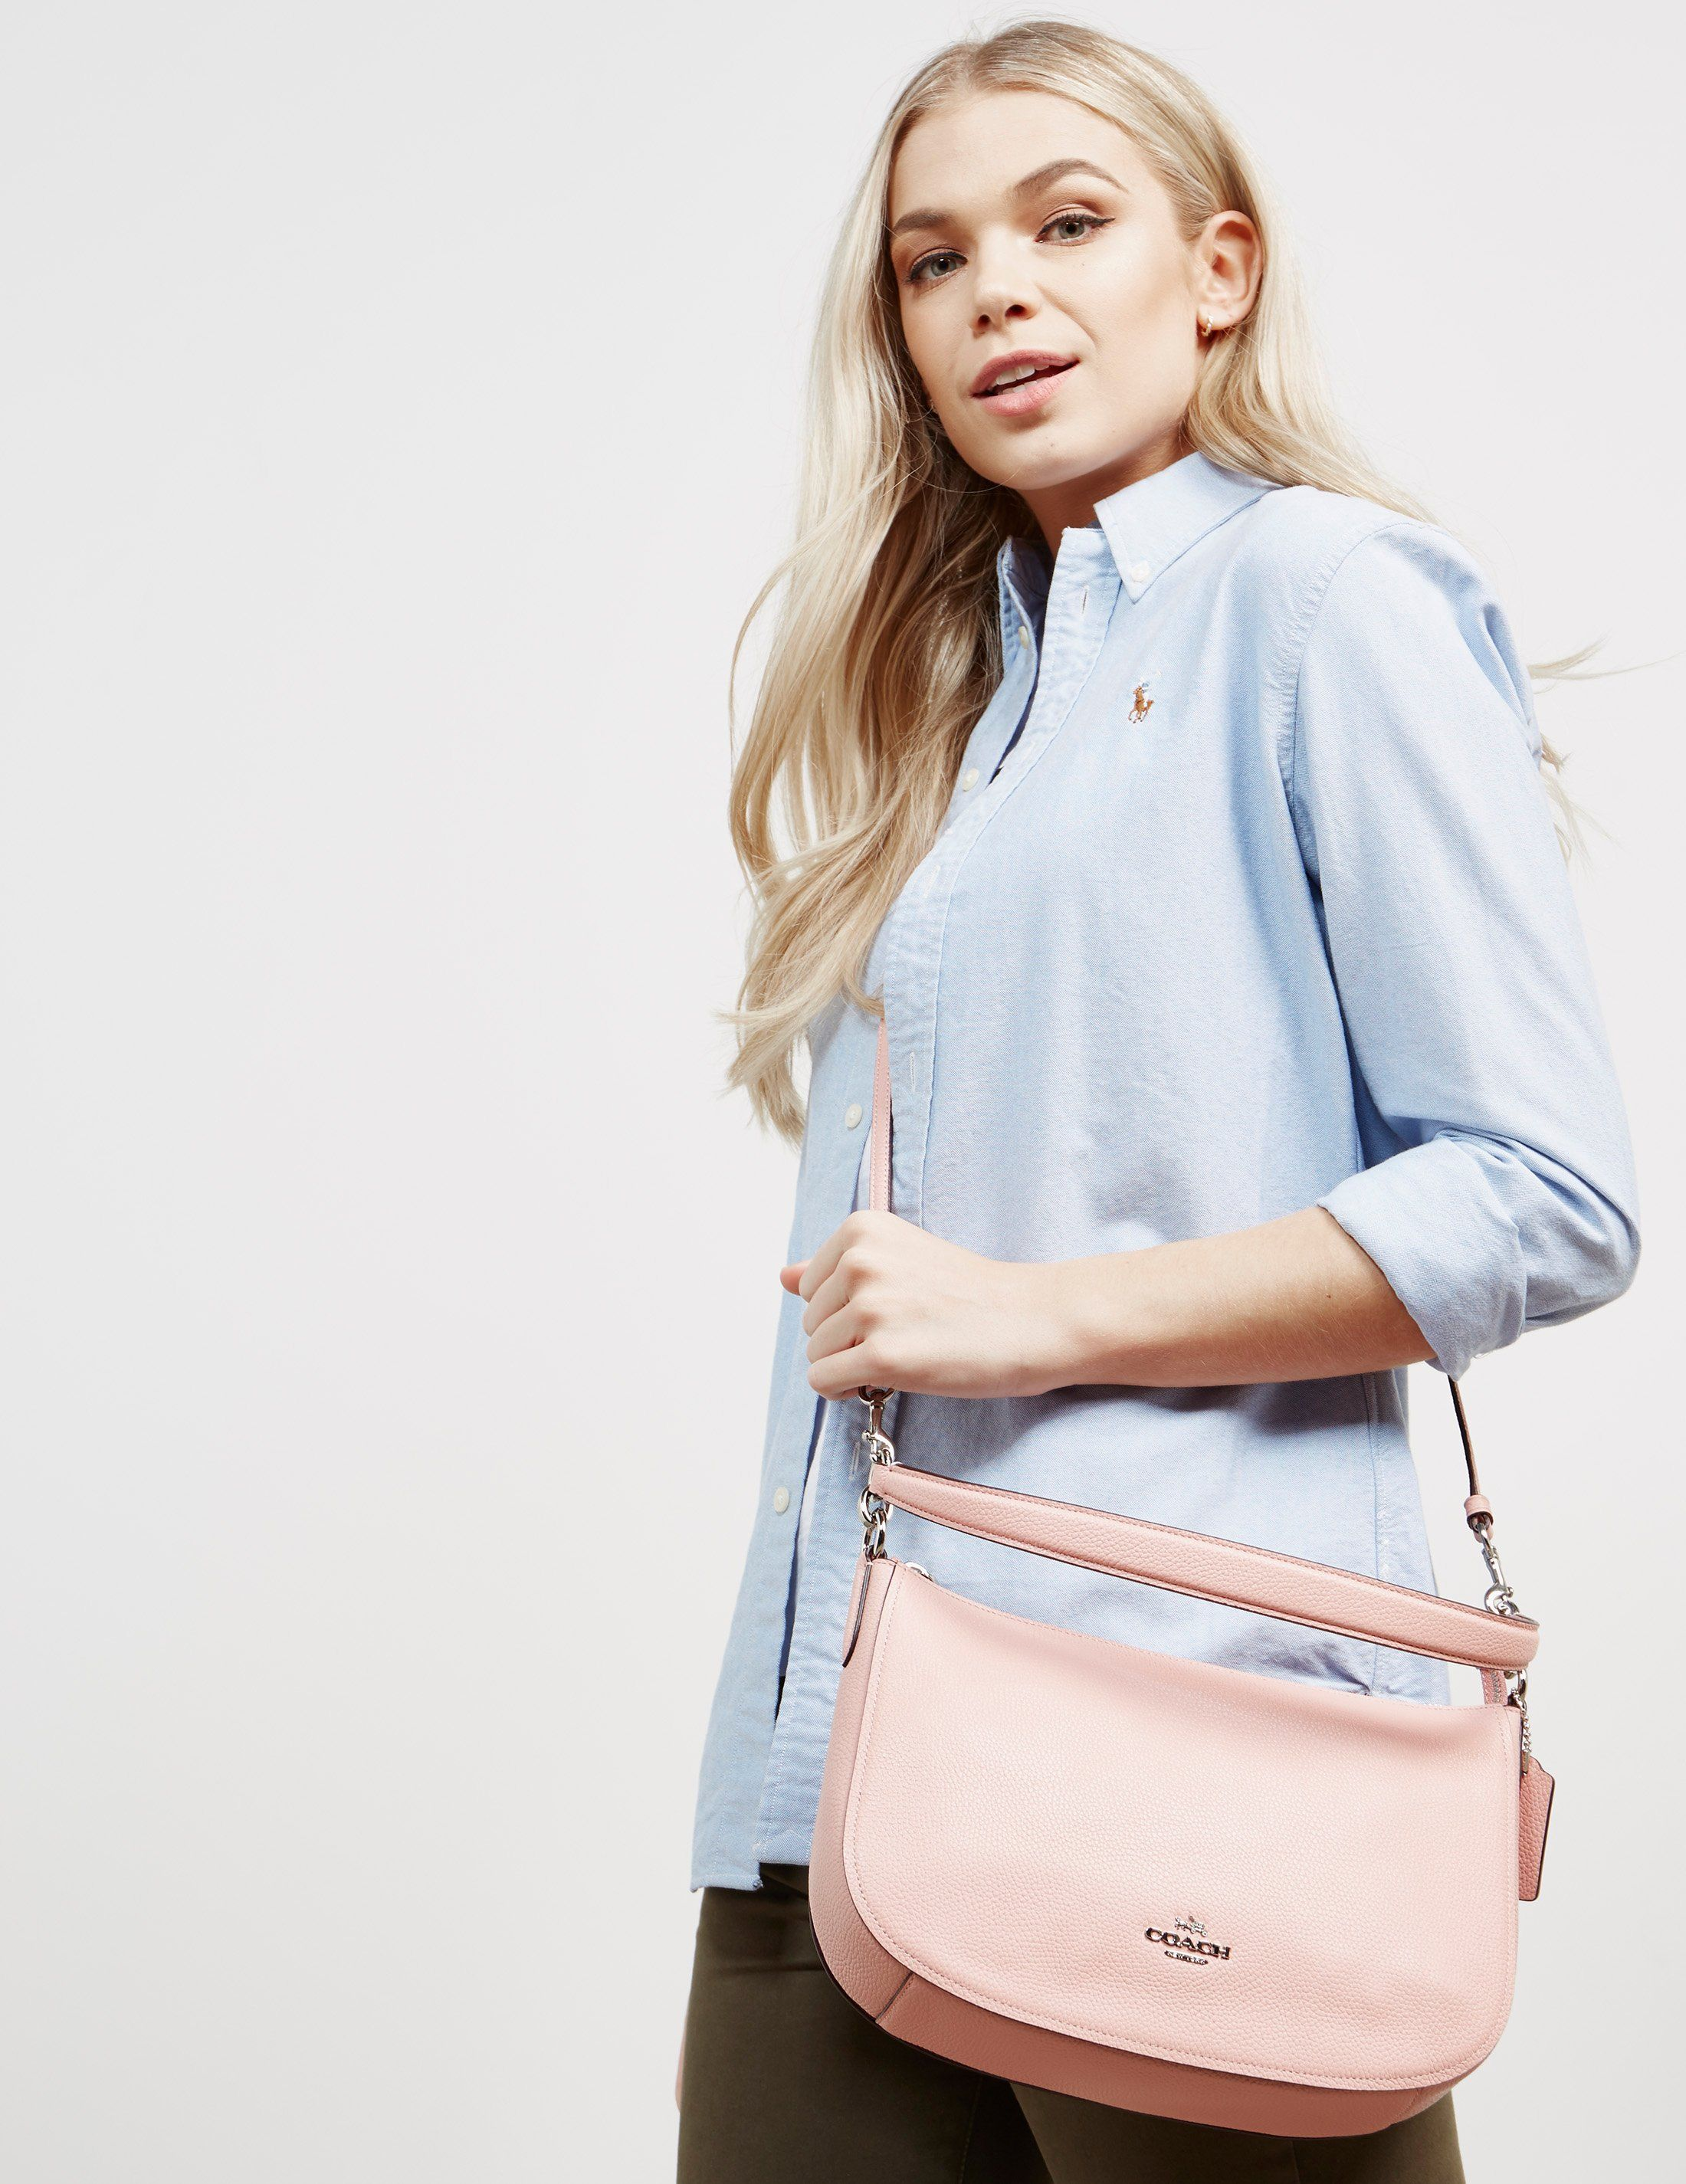 COACH Chels Small Bag